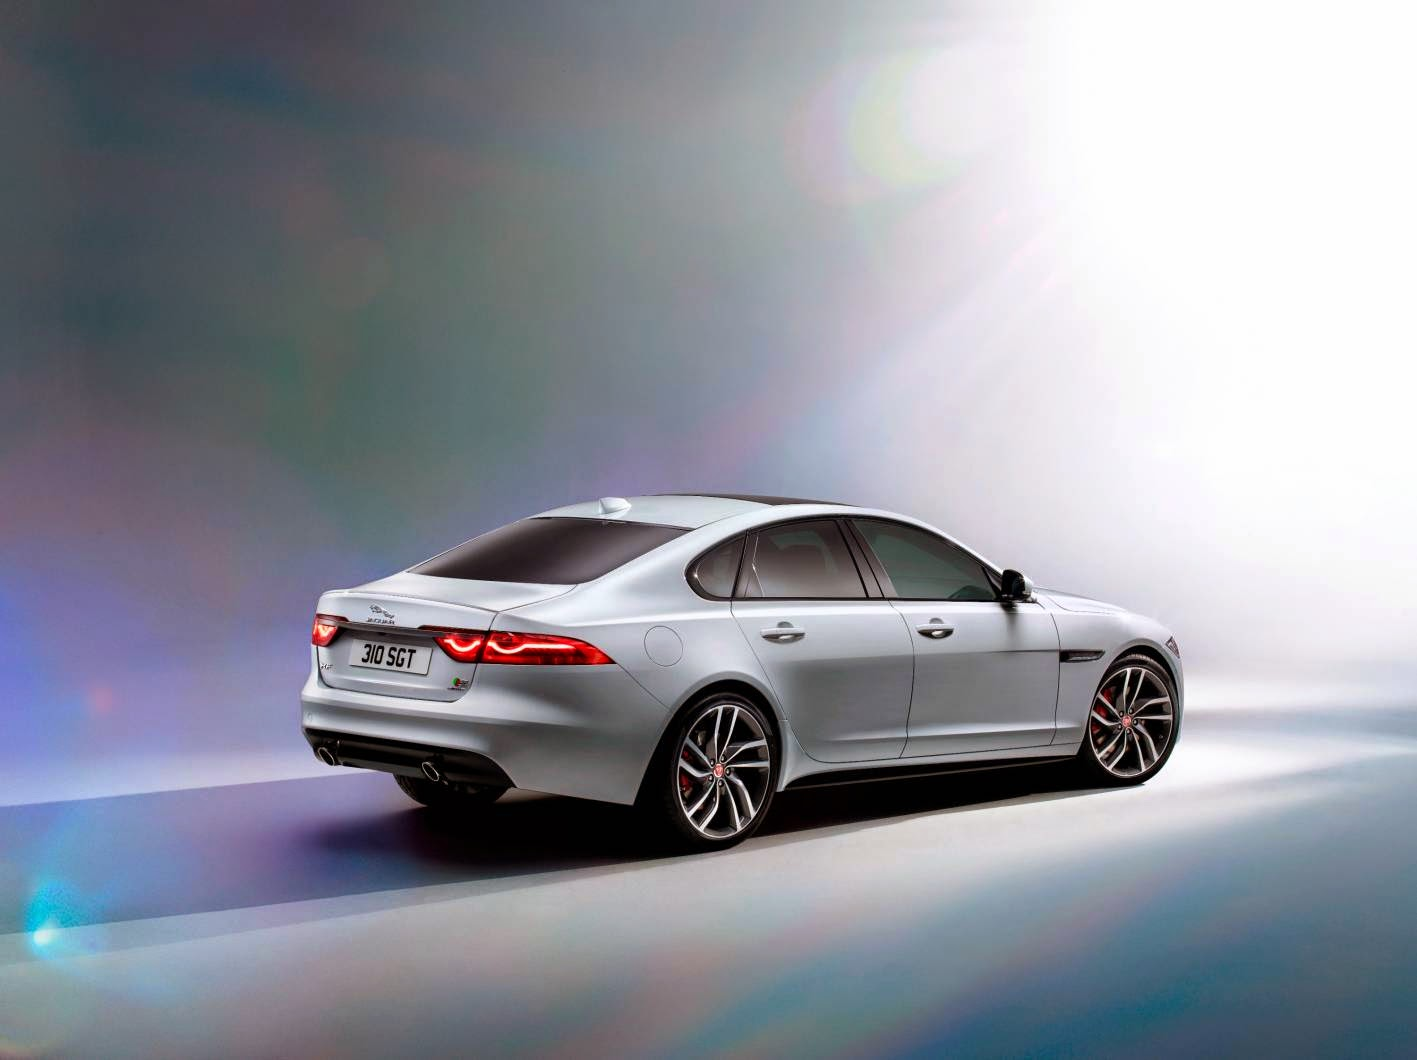 New Jaguar XF rear angle